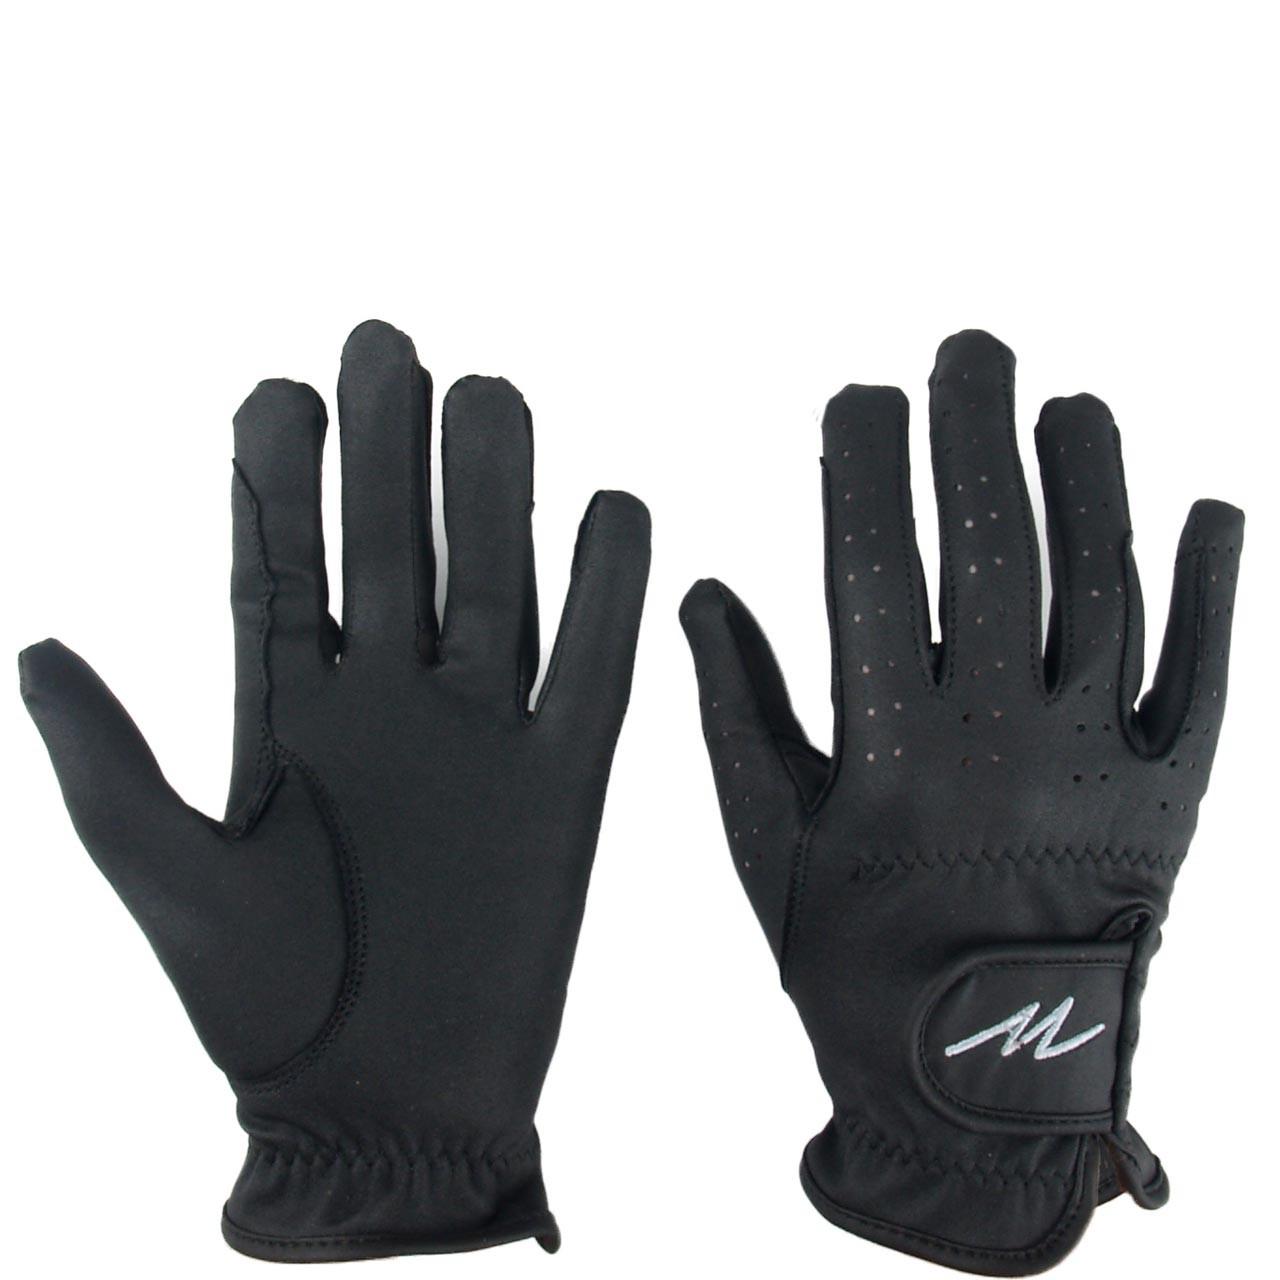 Mondoni Leatherfeel handschoen